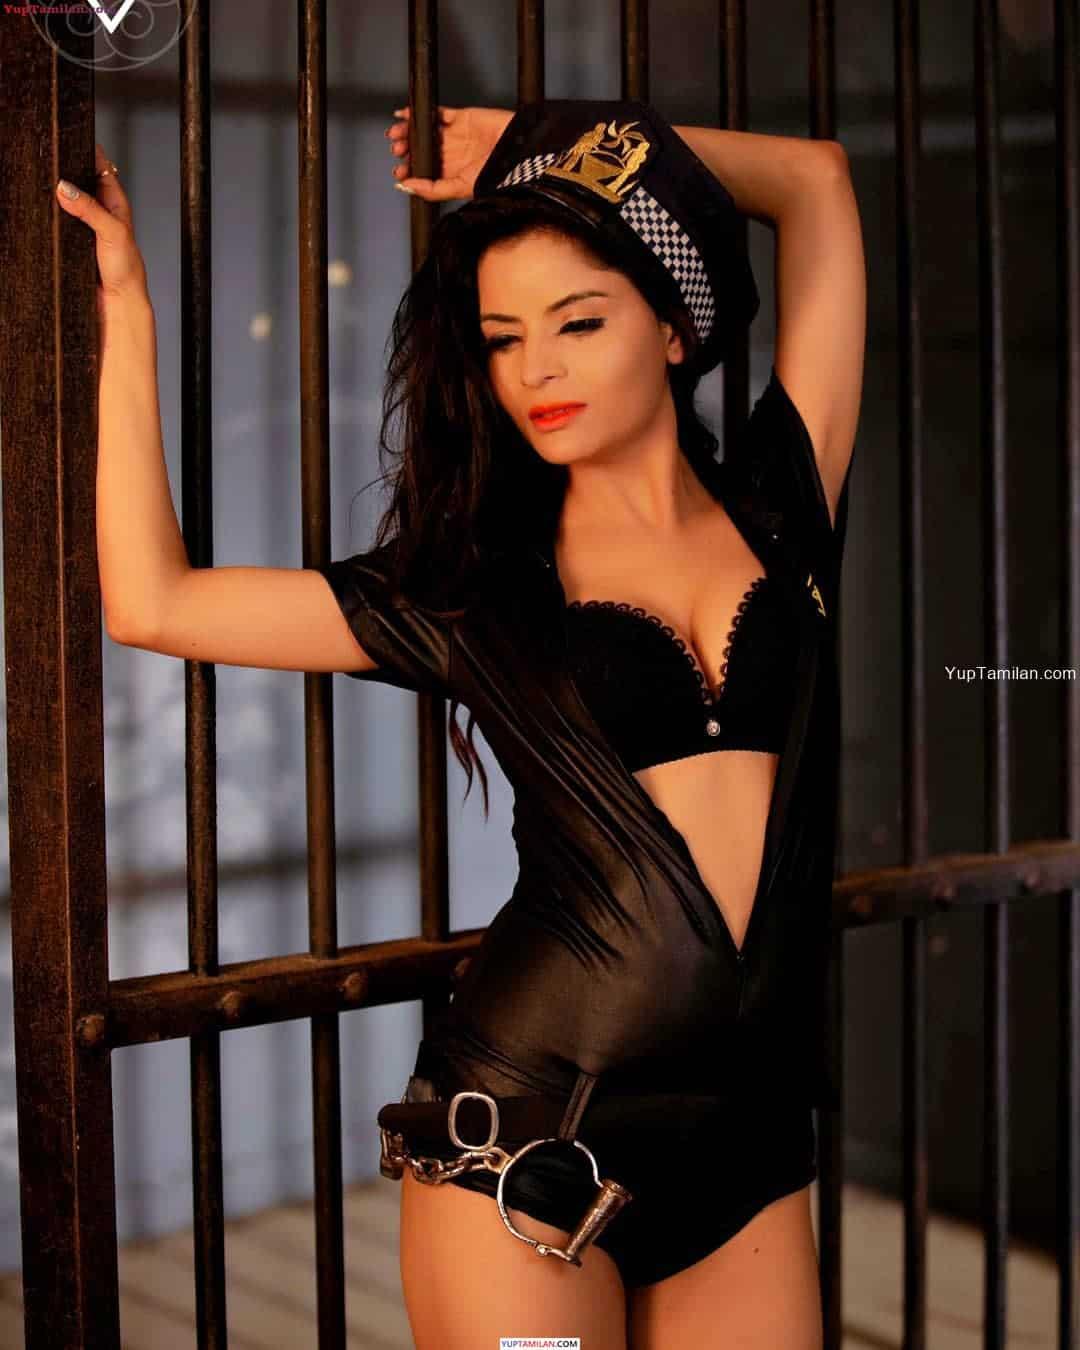 Gehana Vasisth Hot Photos in Bra- Boobs cleavage Pics